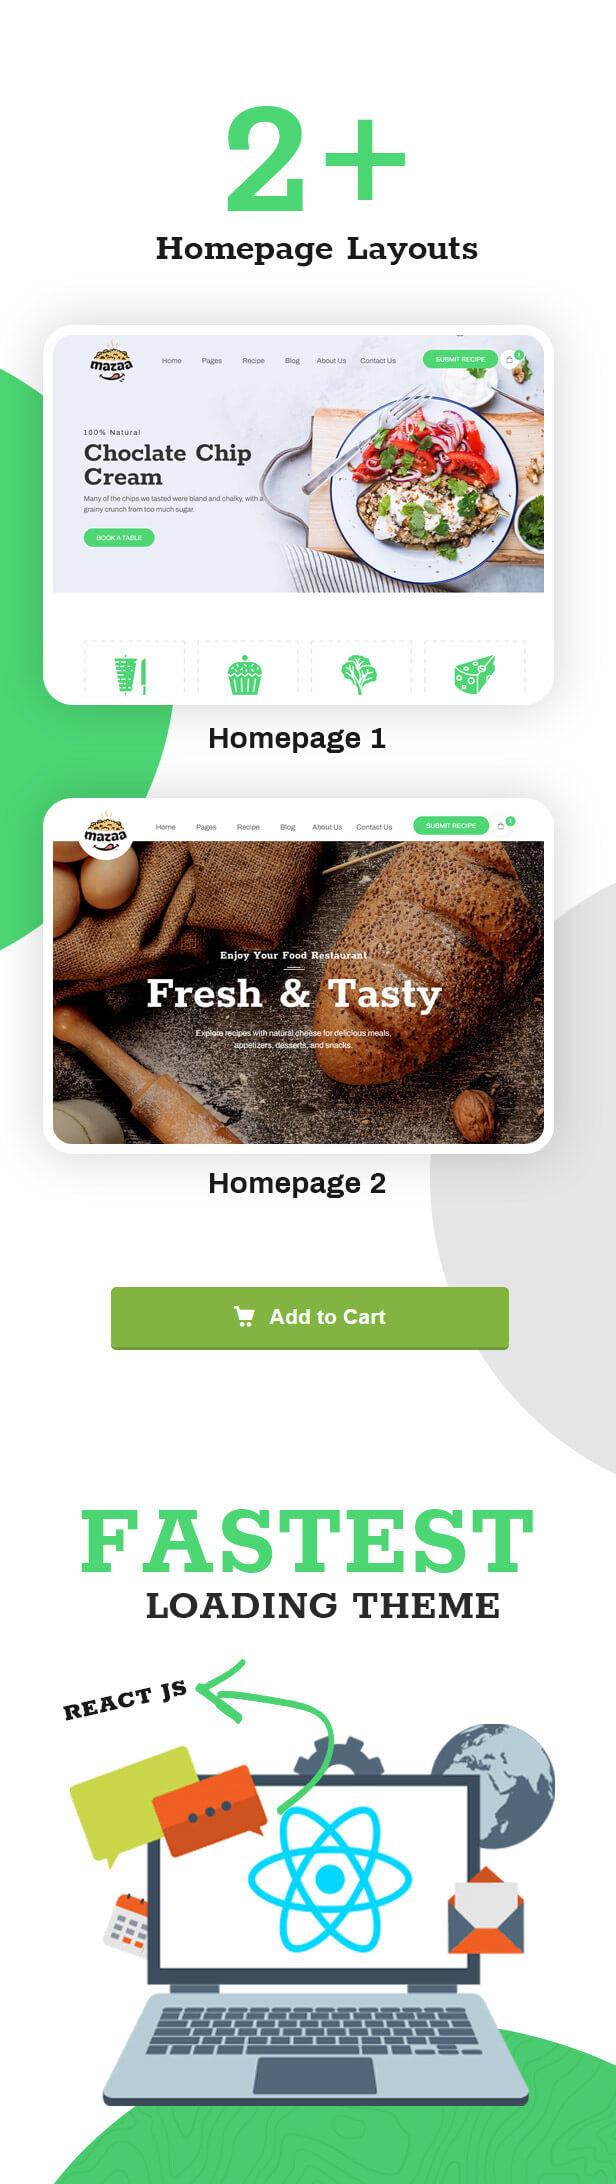 Mazaa - Responsive Restaurant or Eatery React Template - 2